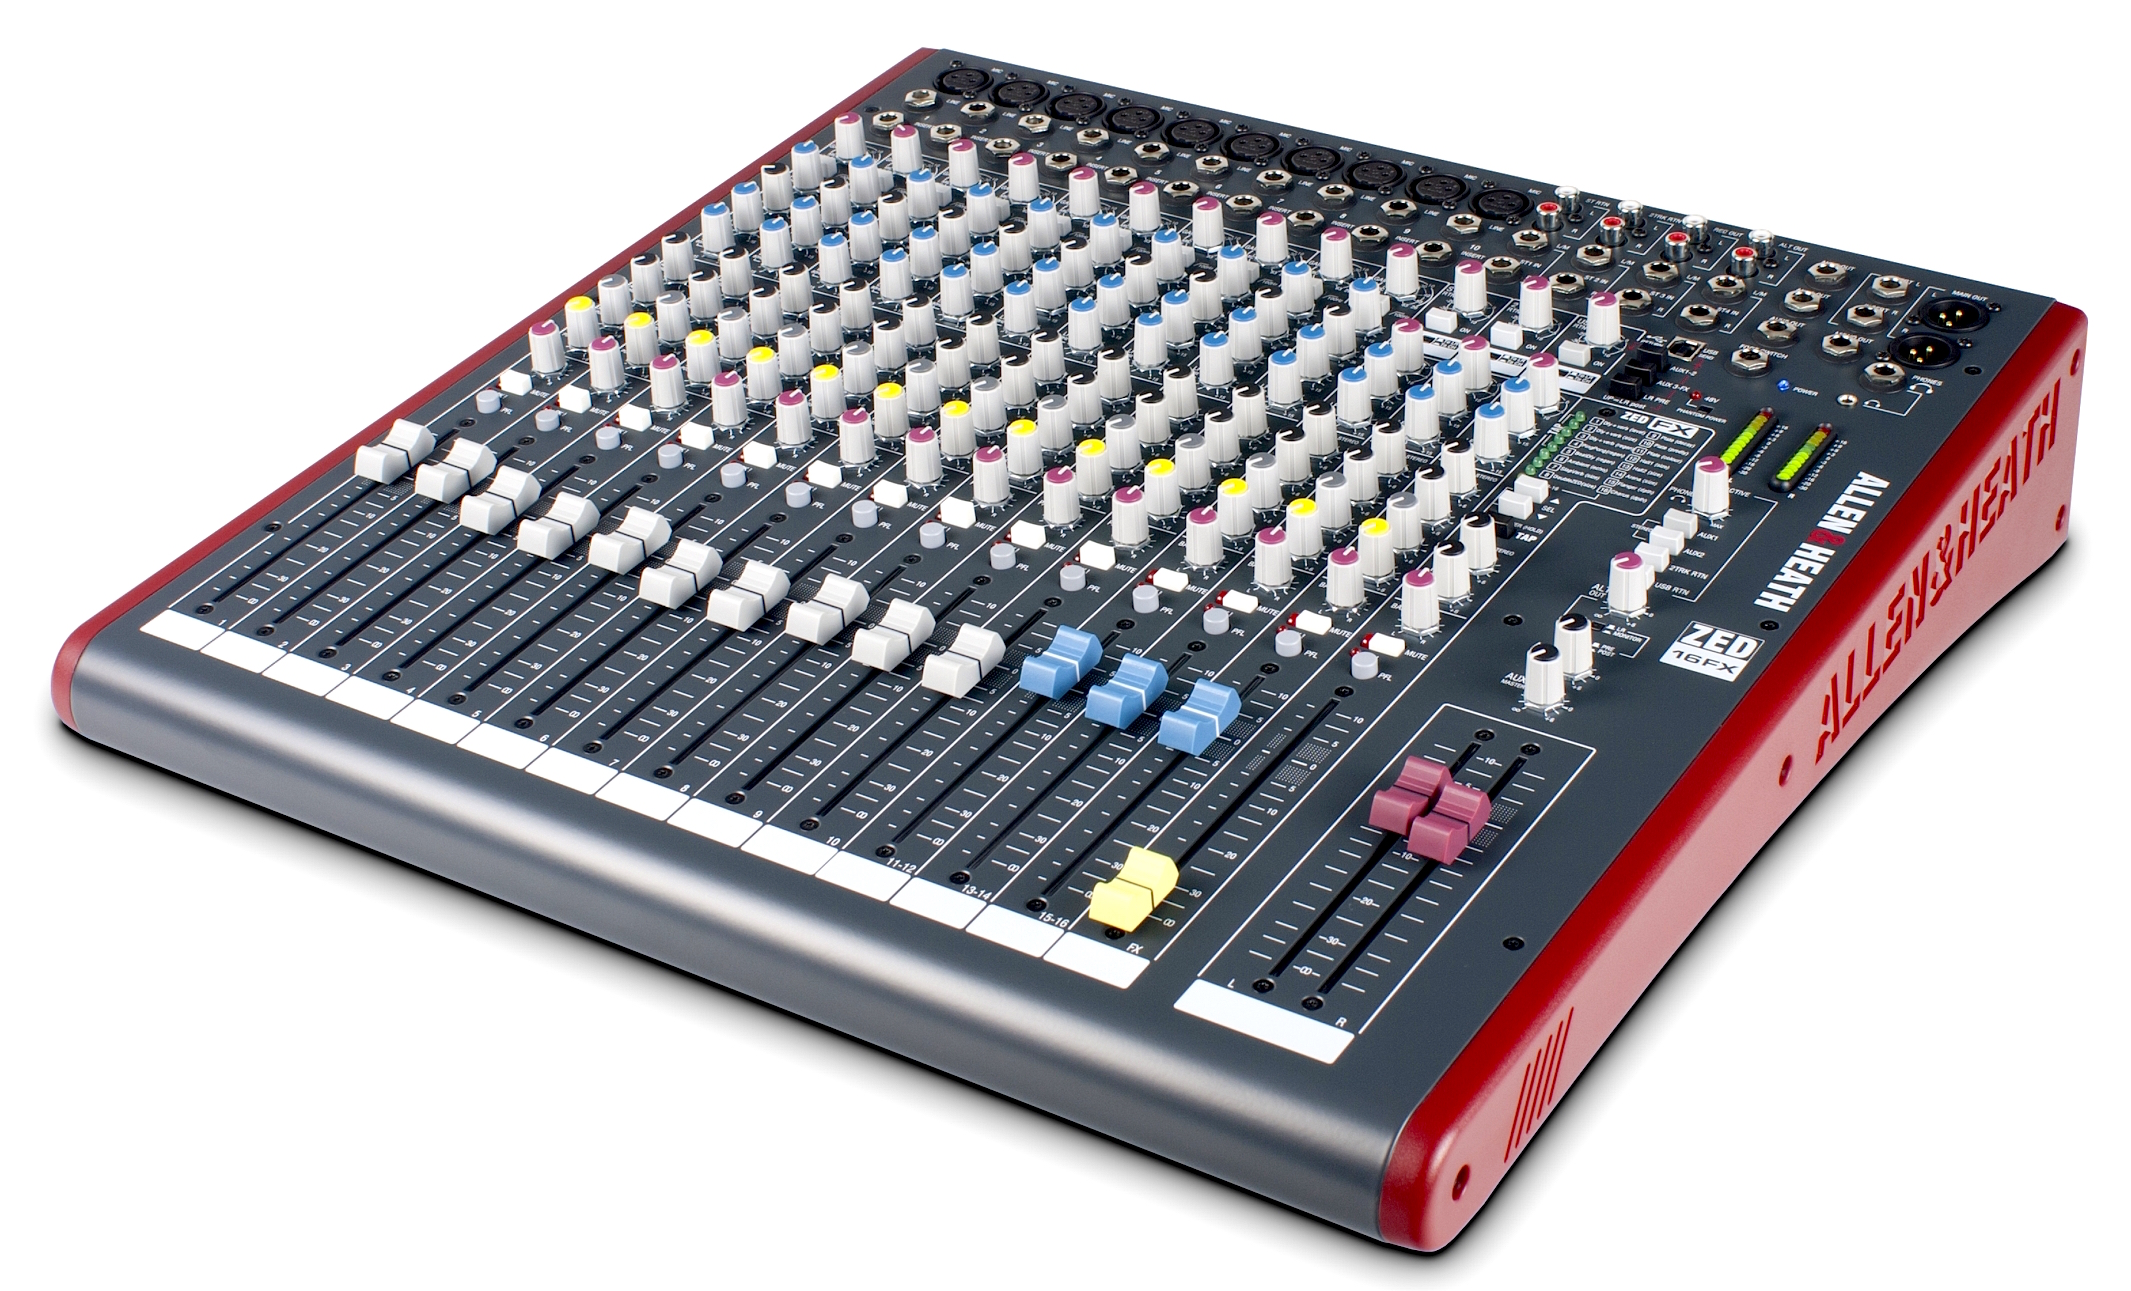 allen heath zed 16 fx audio mixer. Black Bedroom Furniture Sets. Home Design Ideas